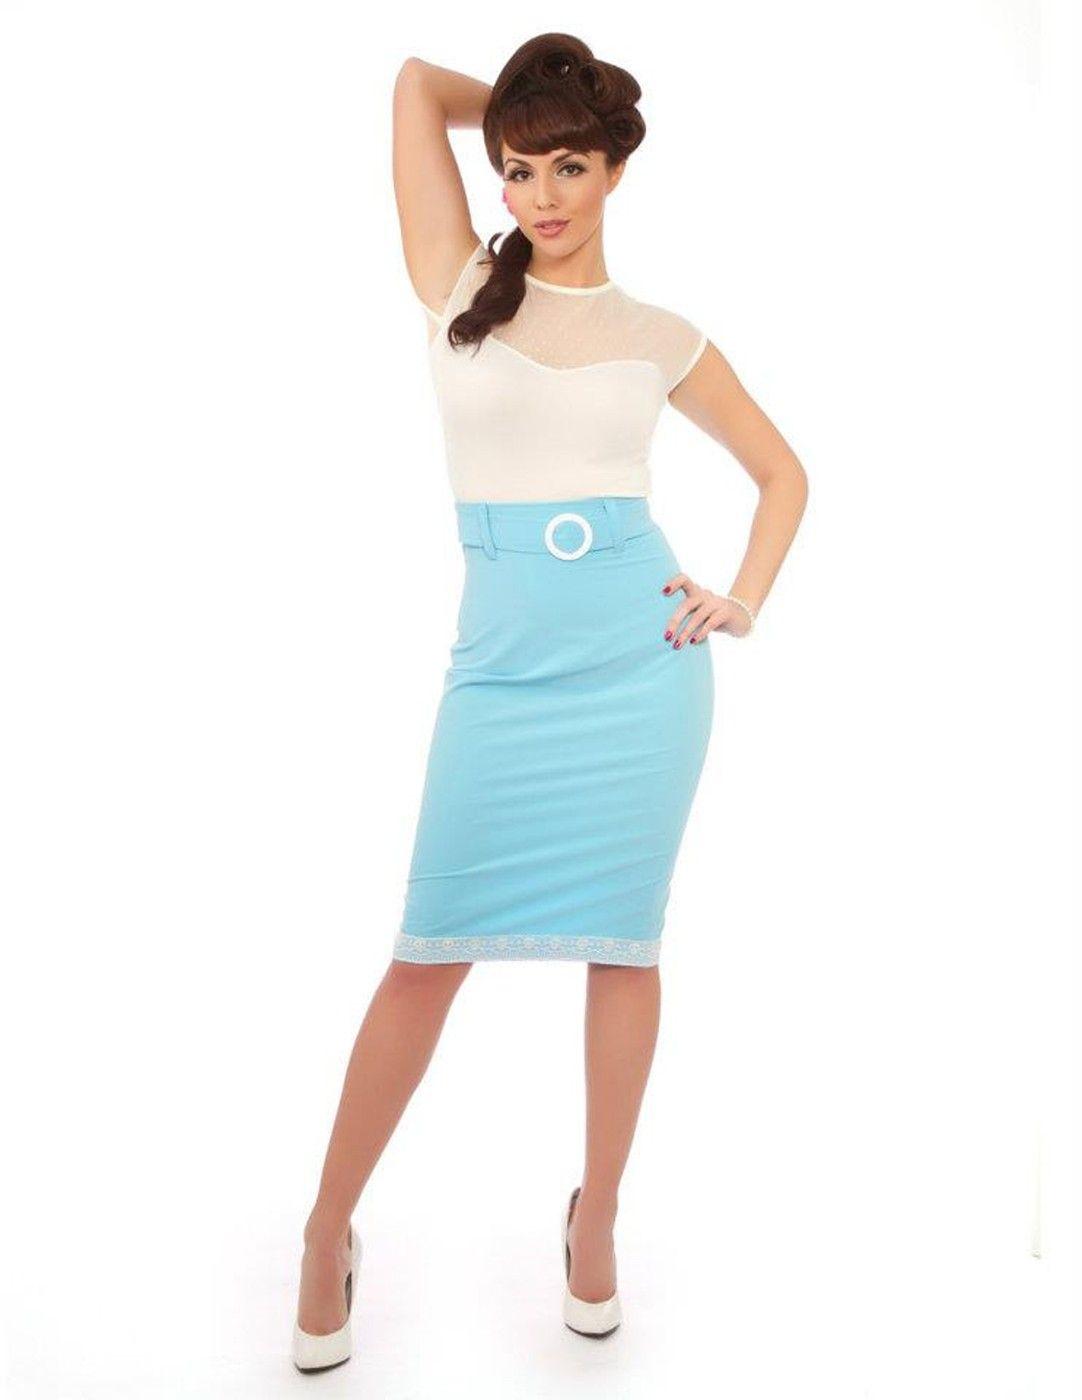 Retro Pin Up 50s Clothing Pencil Skirt Rockabilly